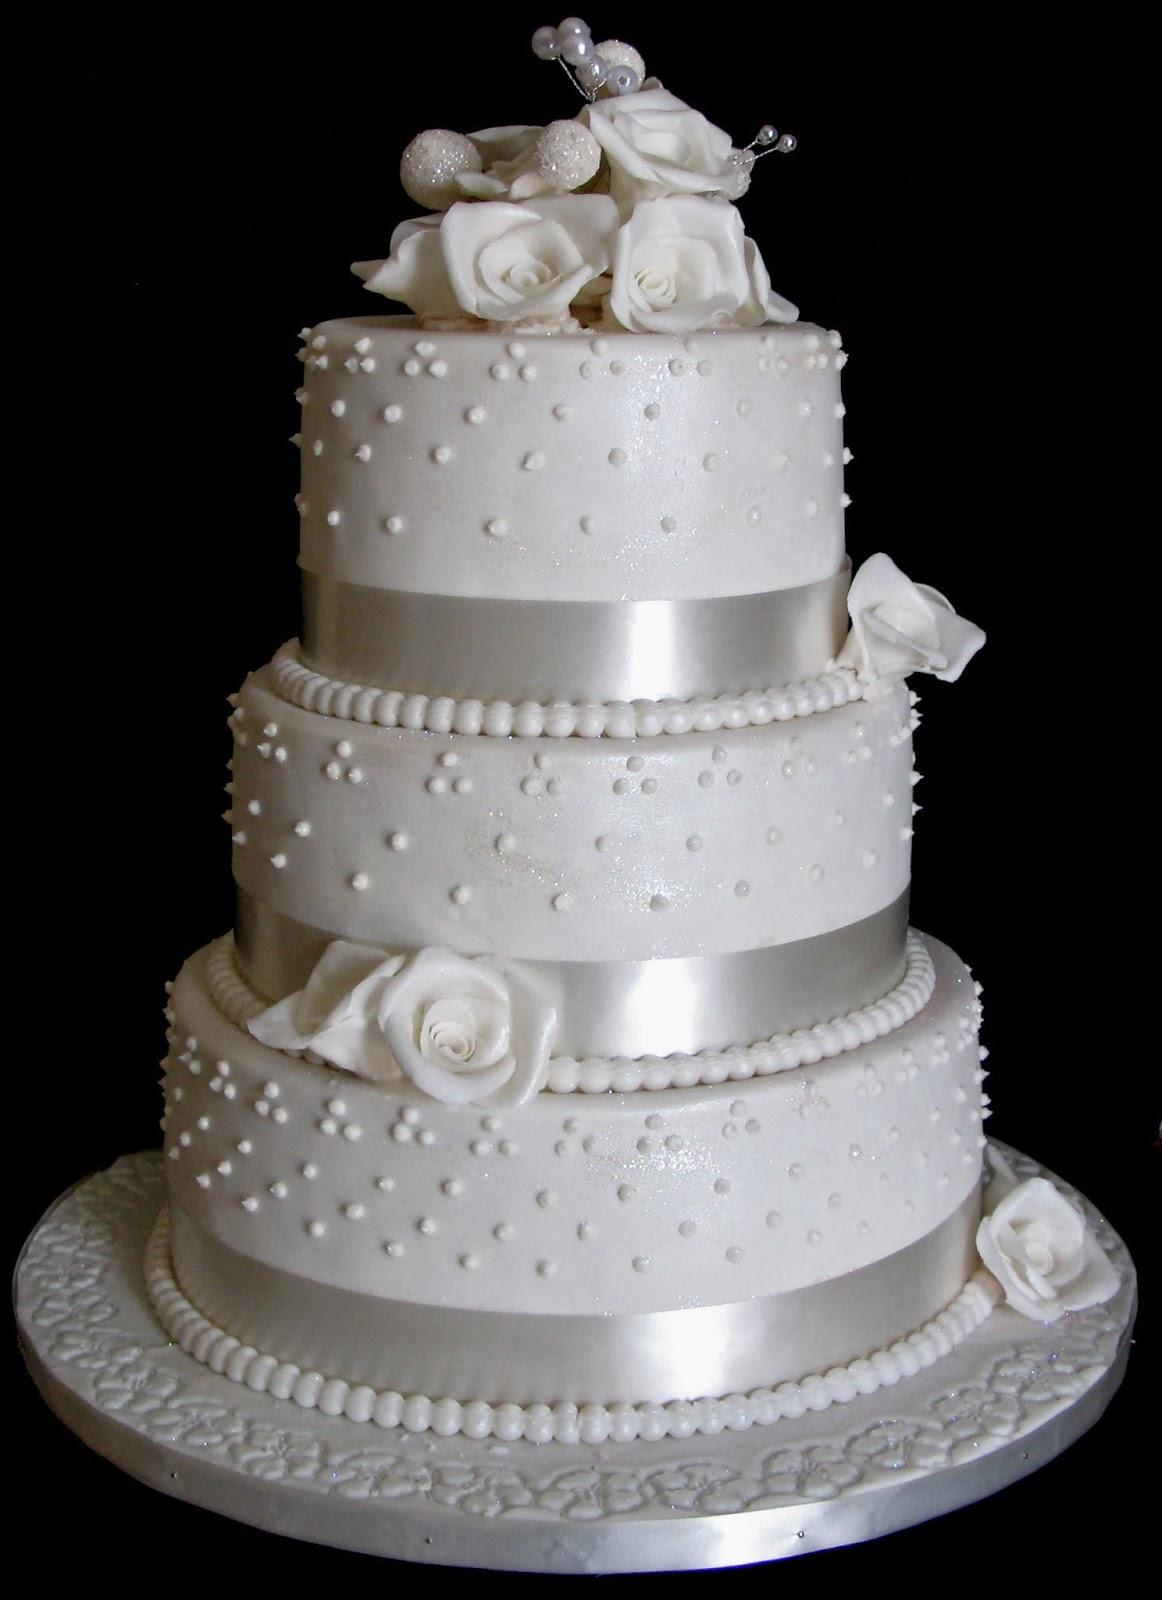 Sugarcraft by Soni: Three Layer Wedding Cake : White Roses